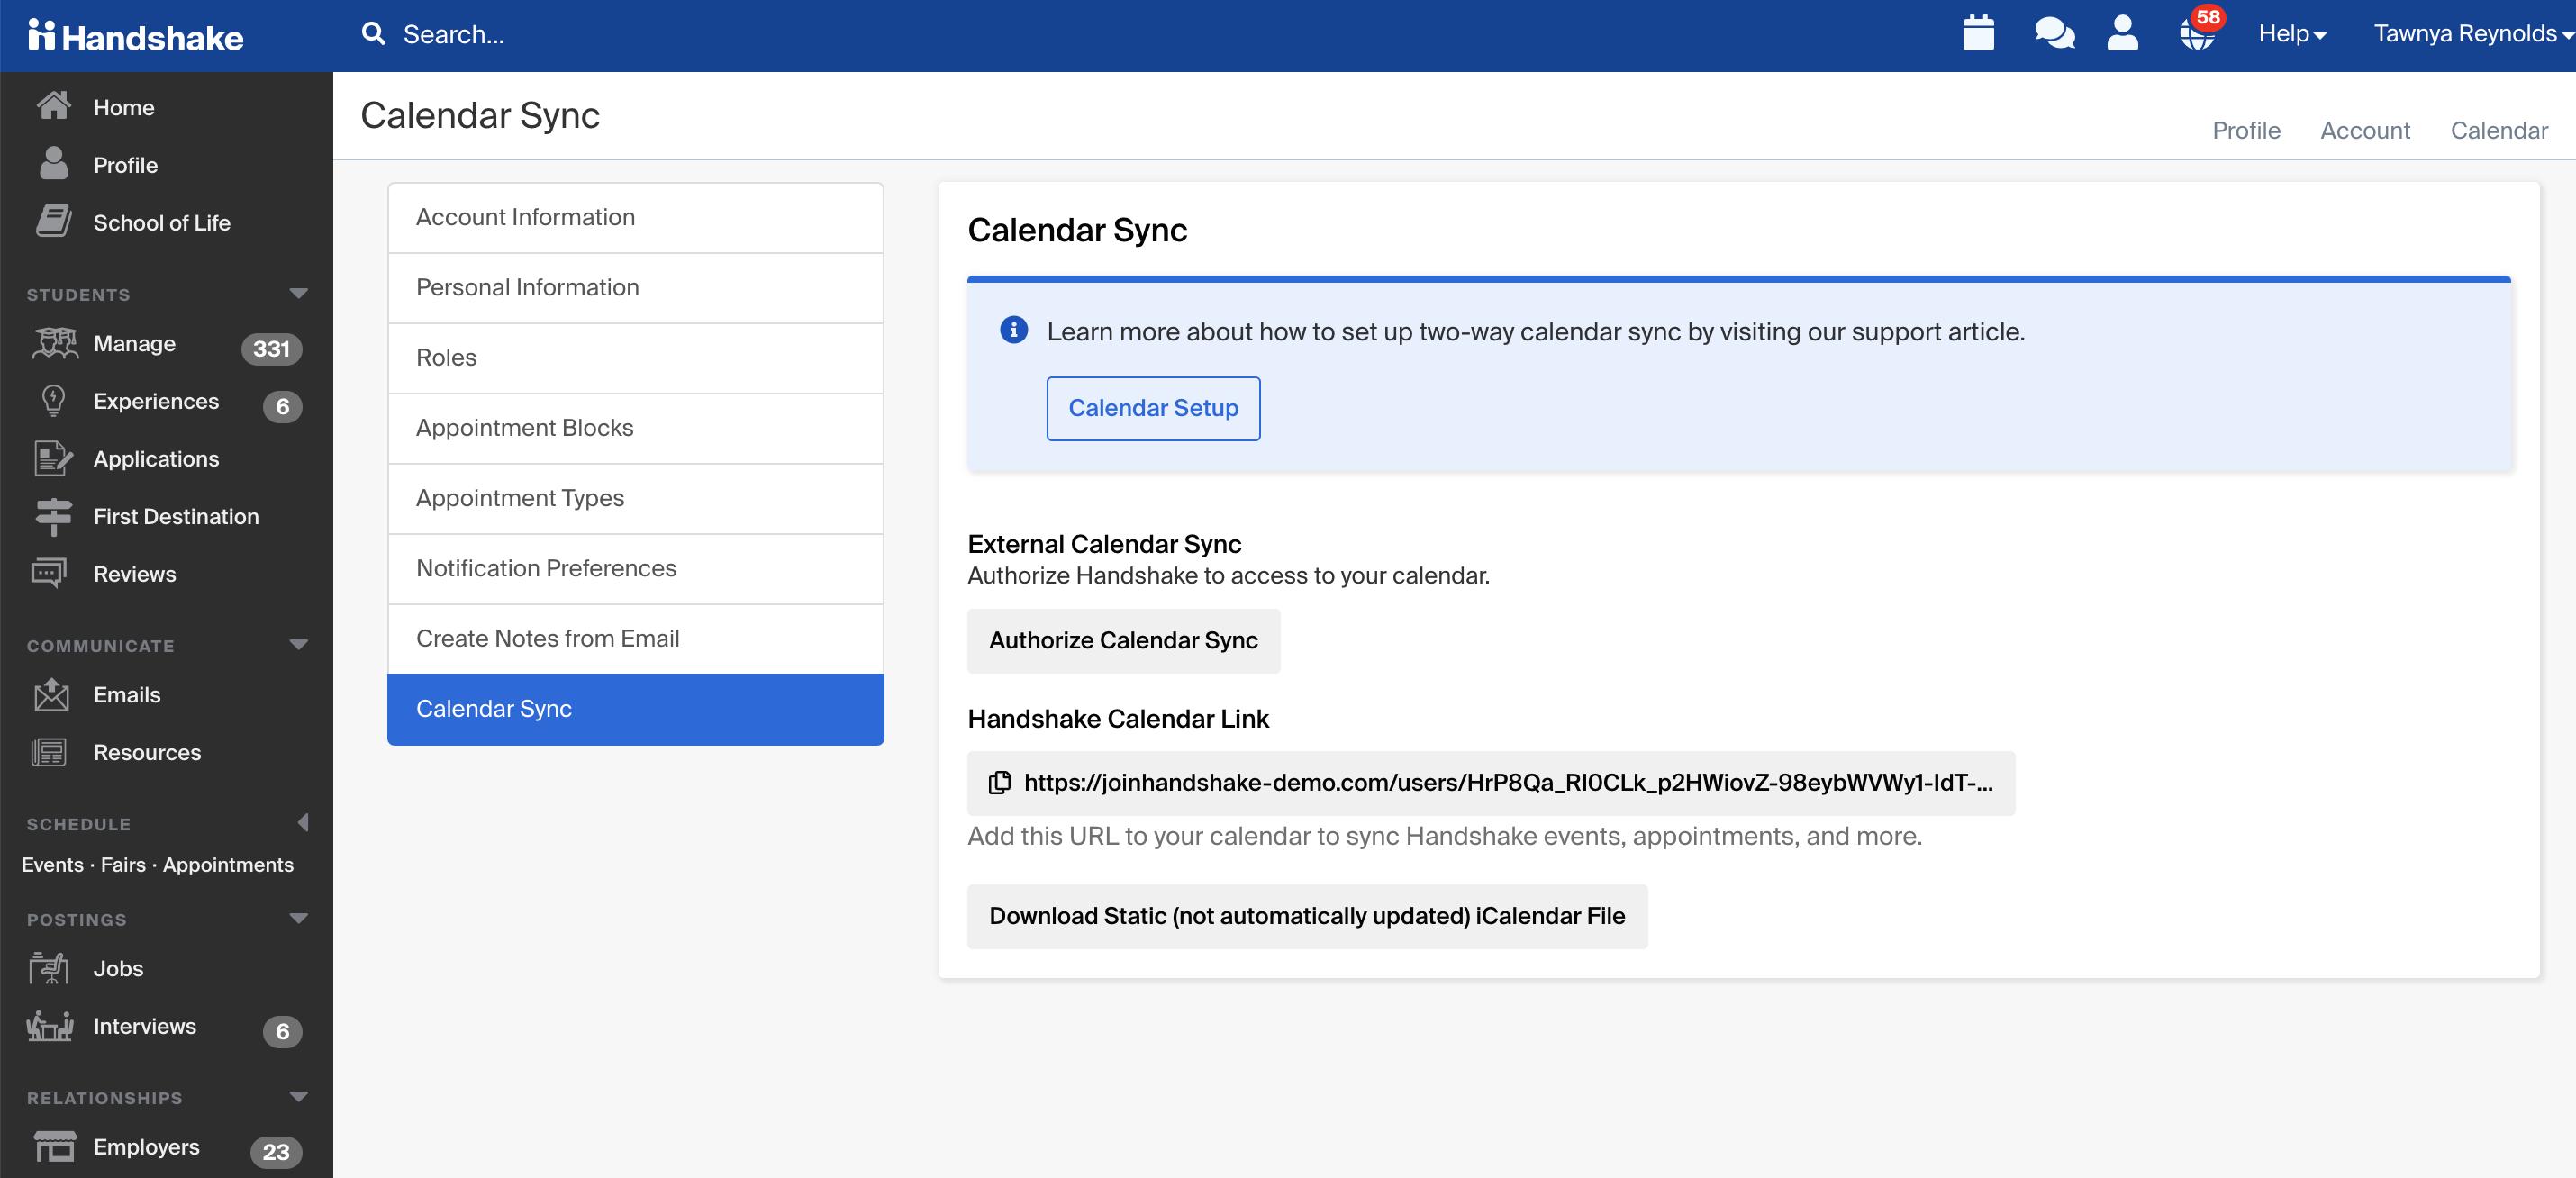 authorize_calendar_sync.png